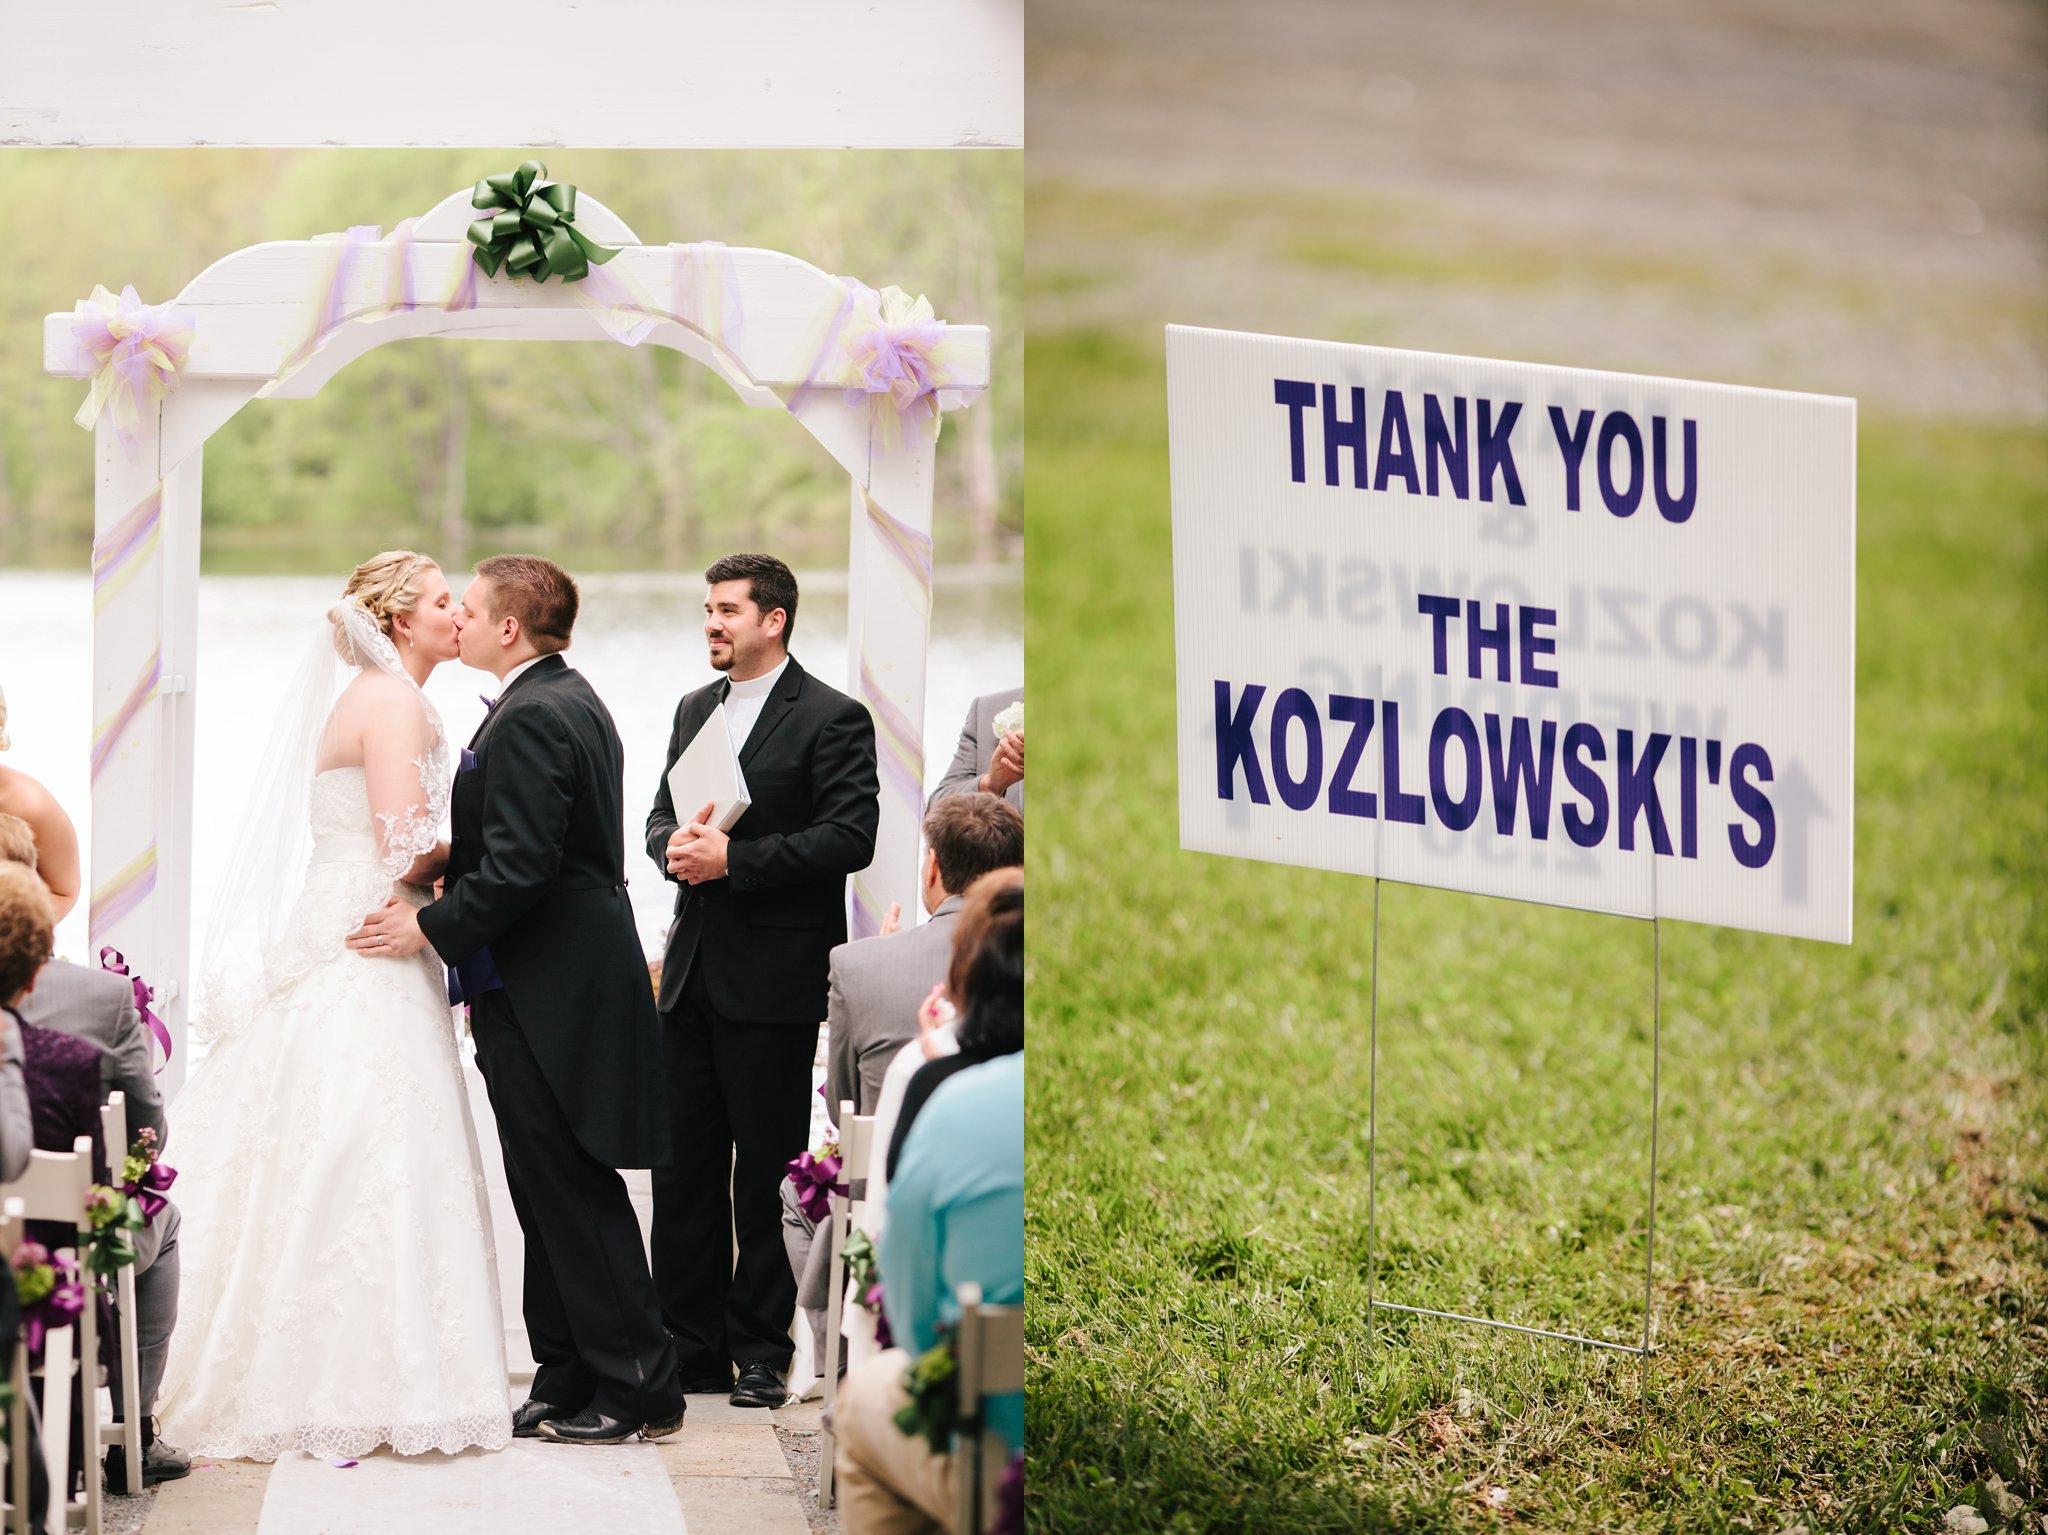 montdale_country_club_wedding_photos_photographer_scranton_pa6614.jpg